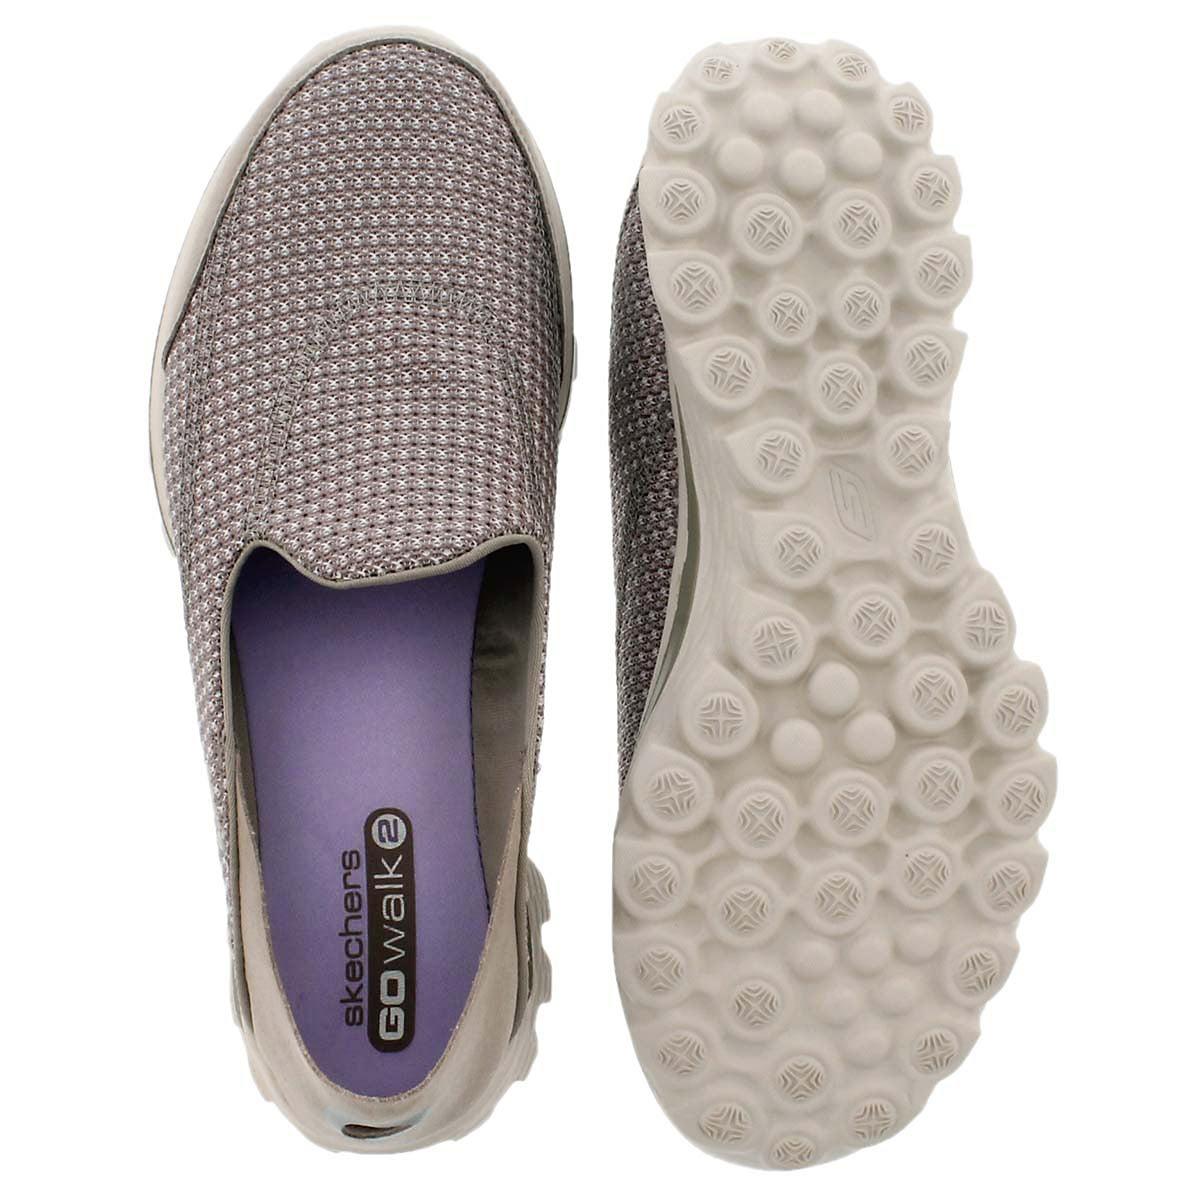 Lds GOwalk Convertible stone slip on